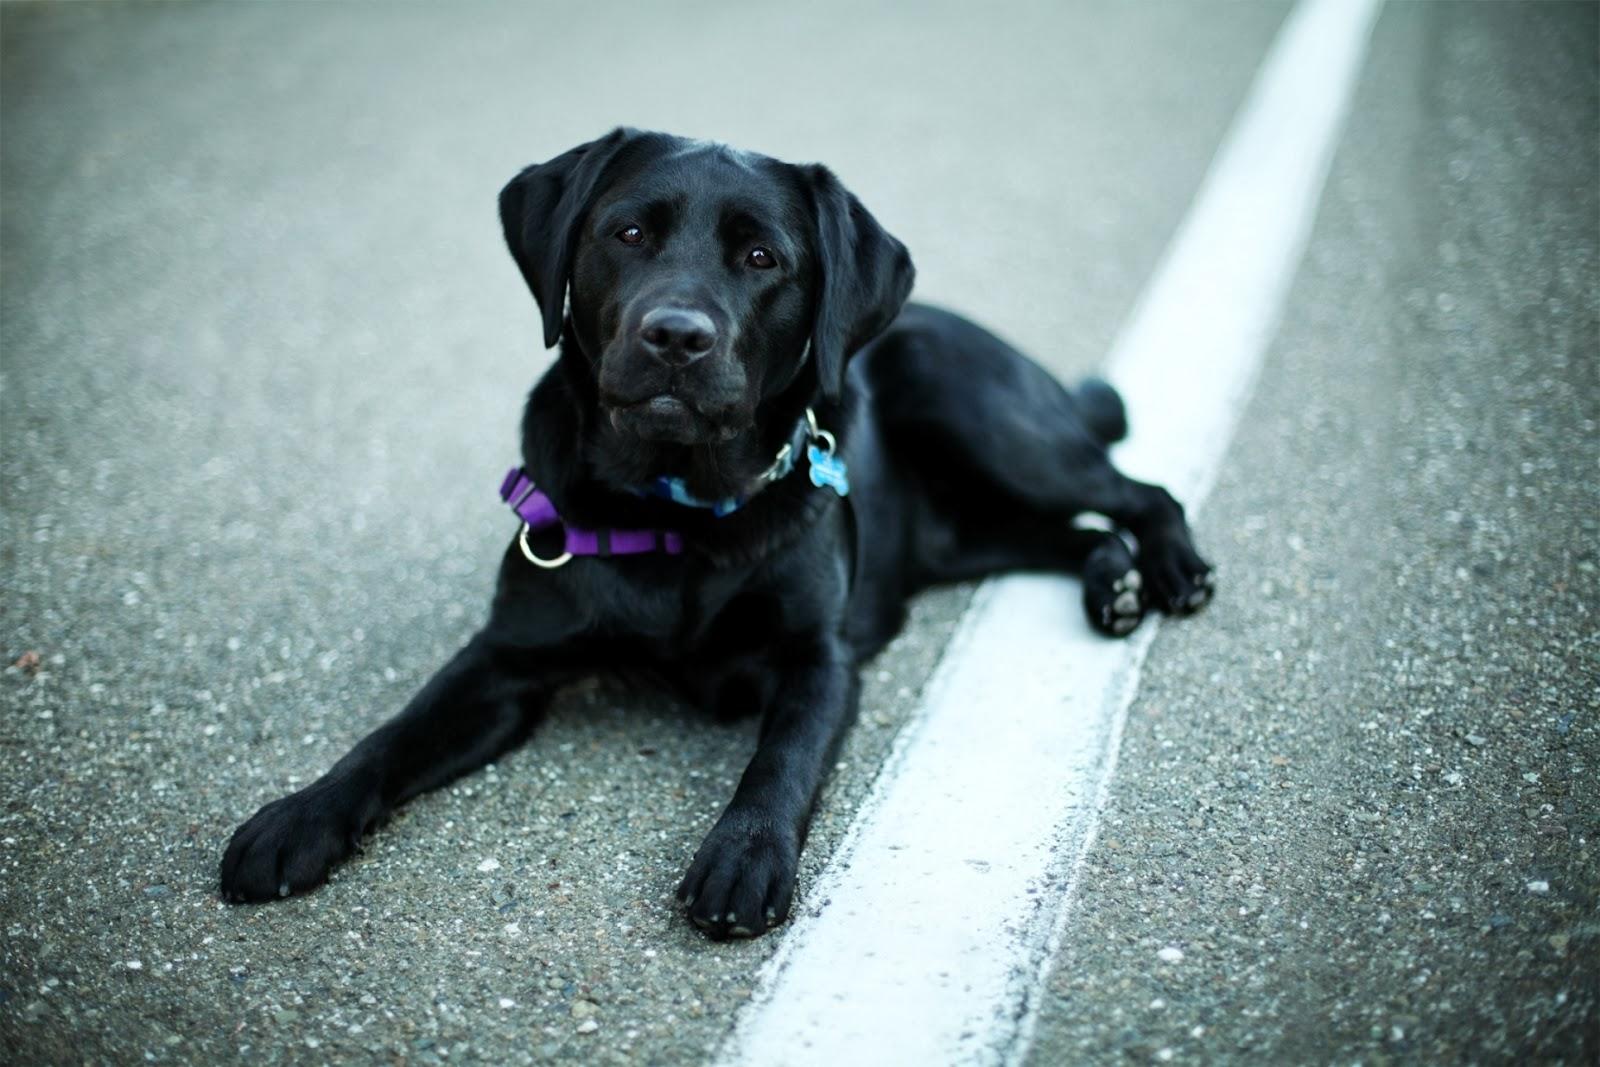 Black Labrador Retriever Wallpaper and Facts Pet Care Tips Advice 1600x1067